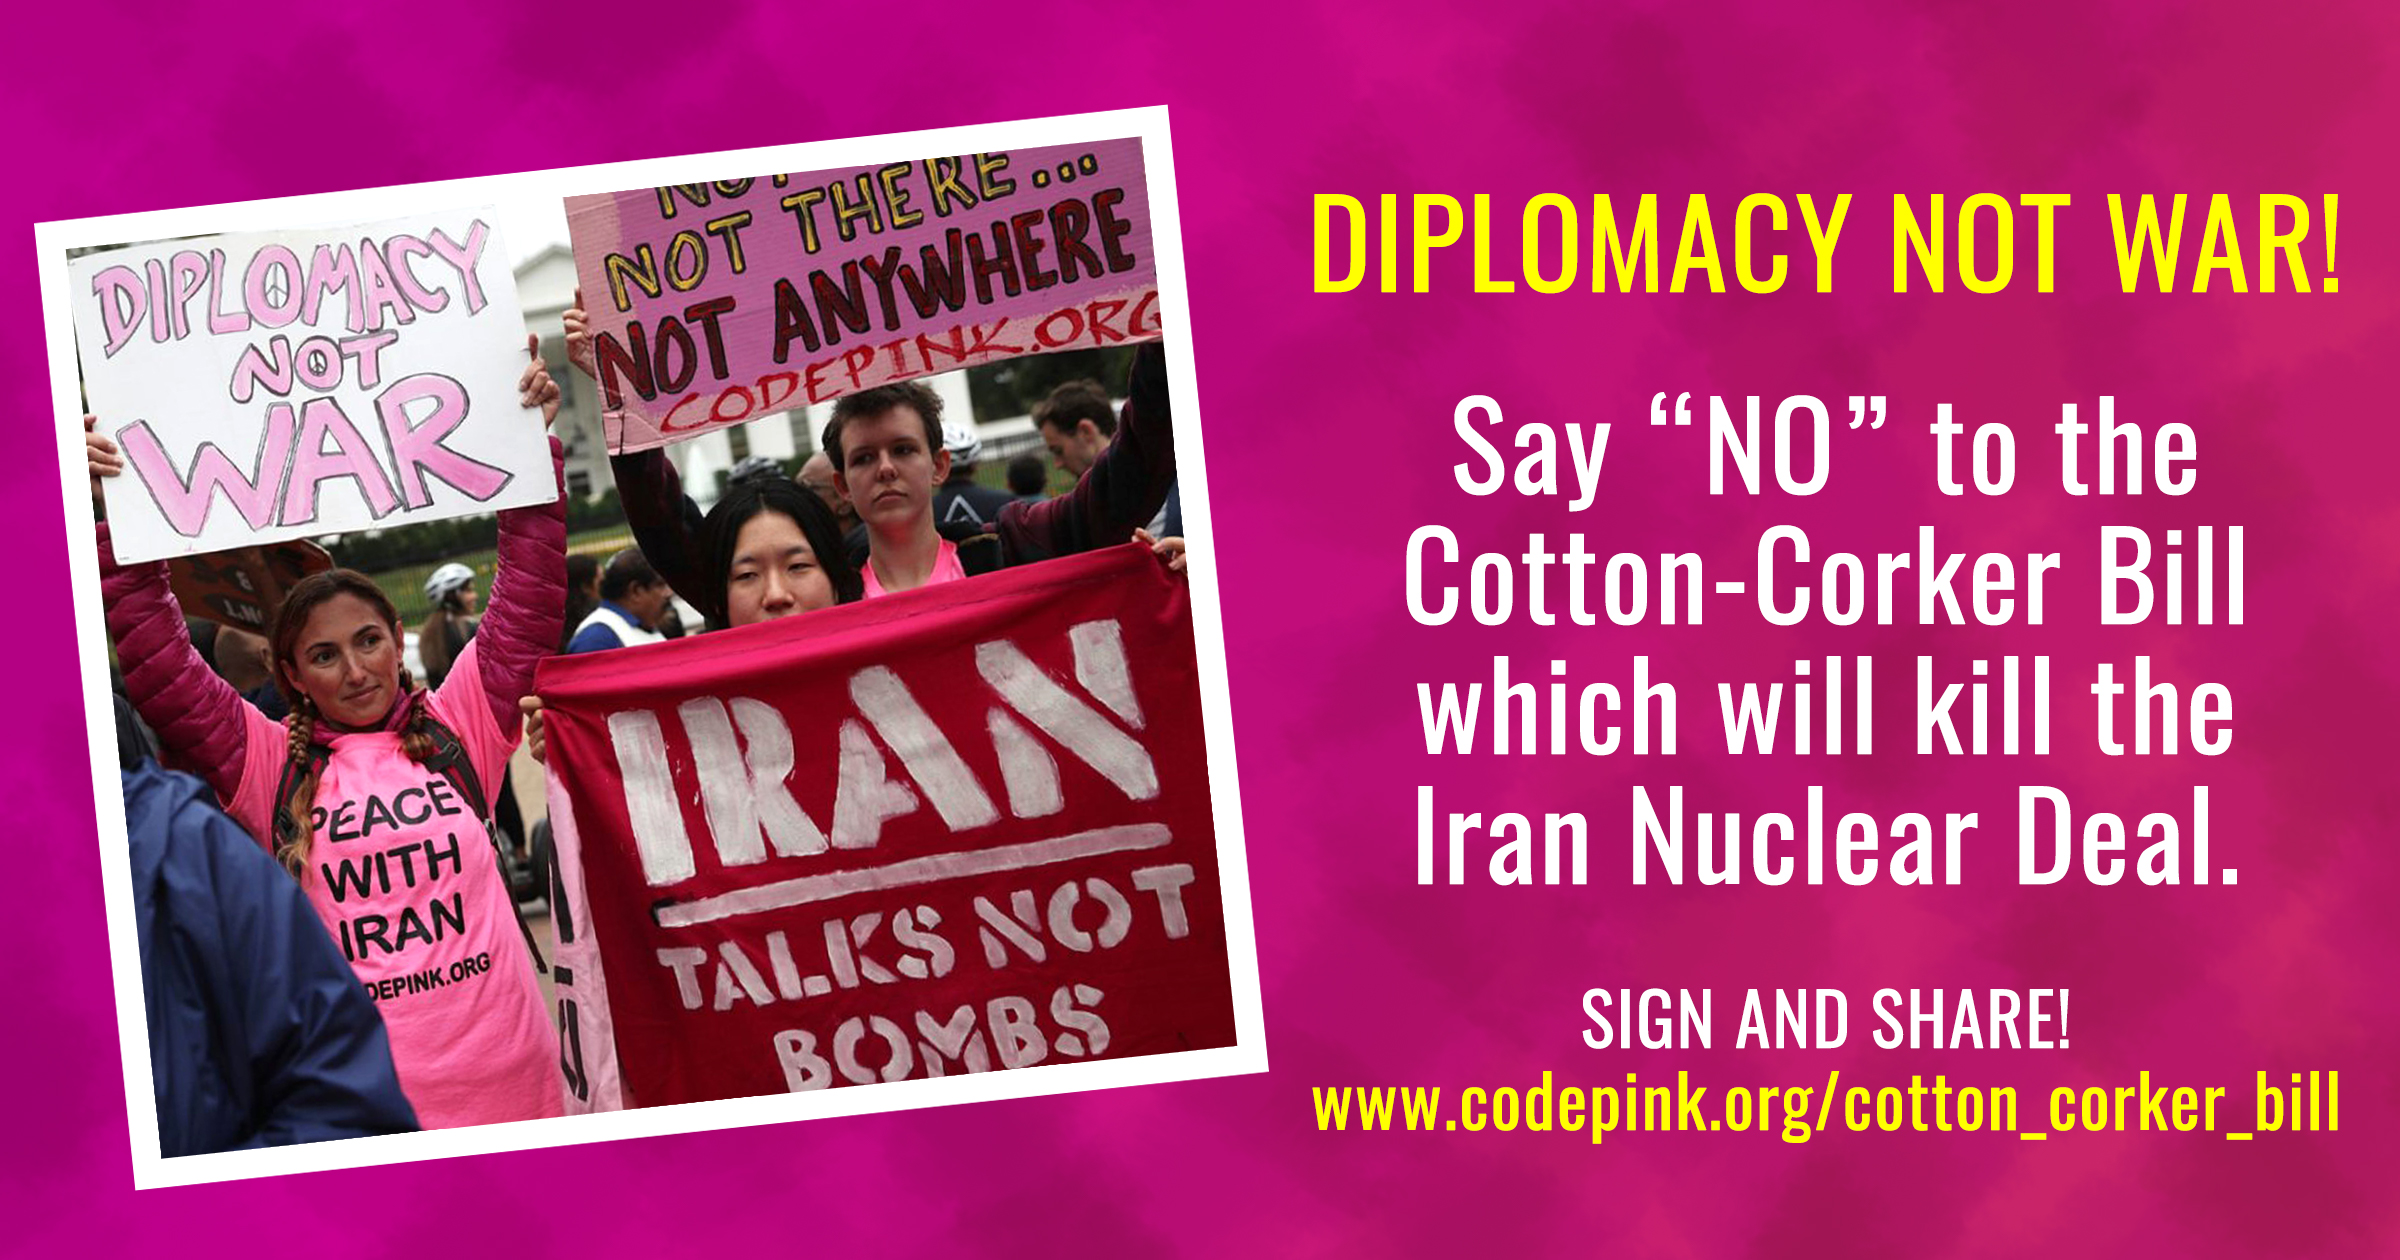 Iran_deal.jpg